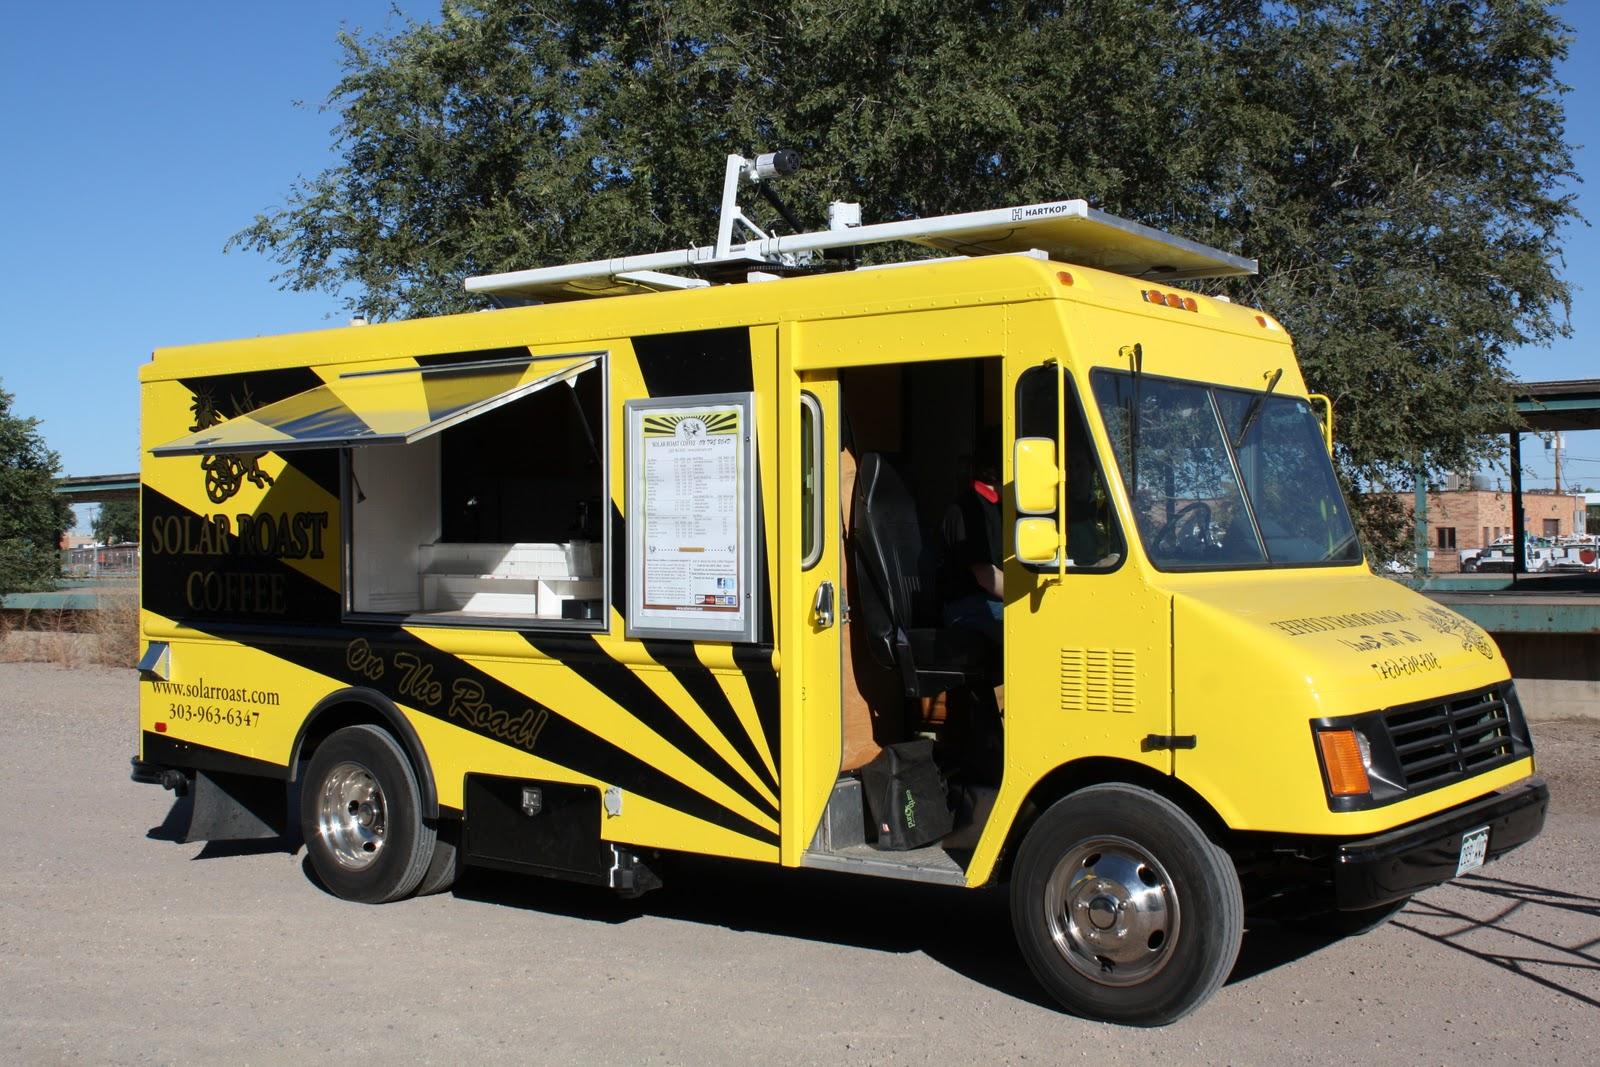 Solar Panels Food Truck